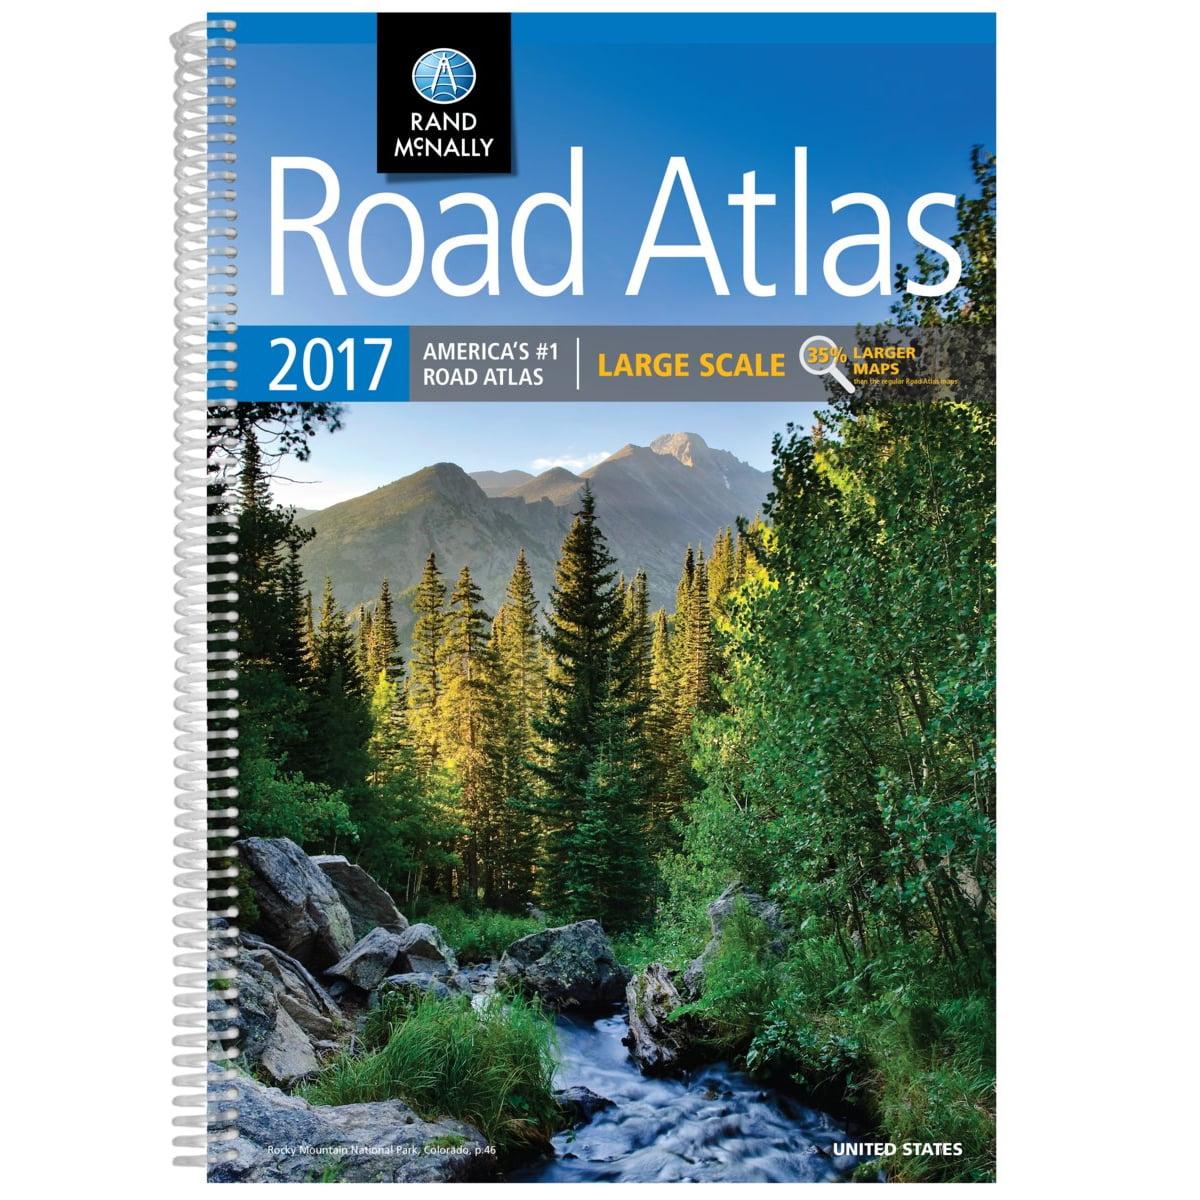 Rand McNally 2017 Road Atlas - Walmart.com